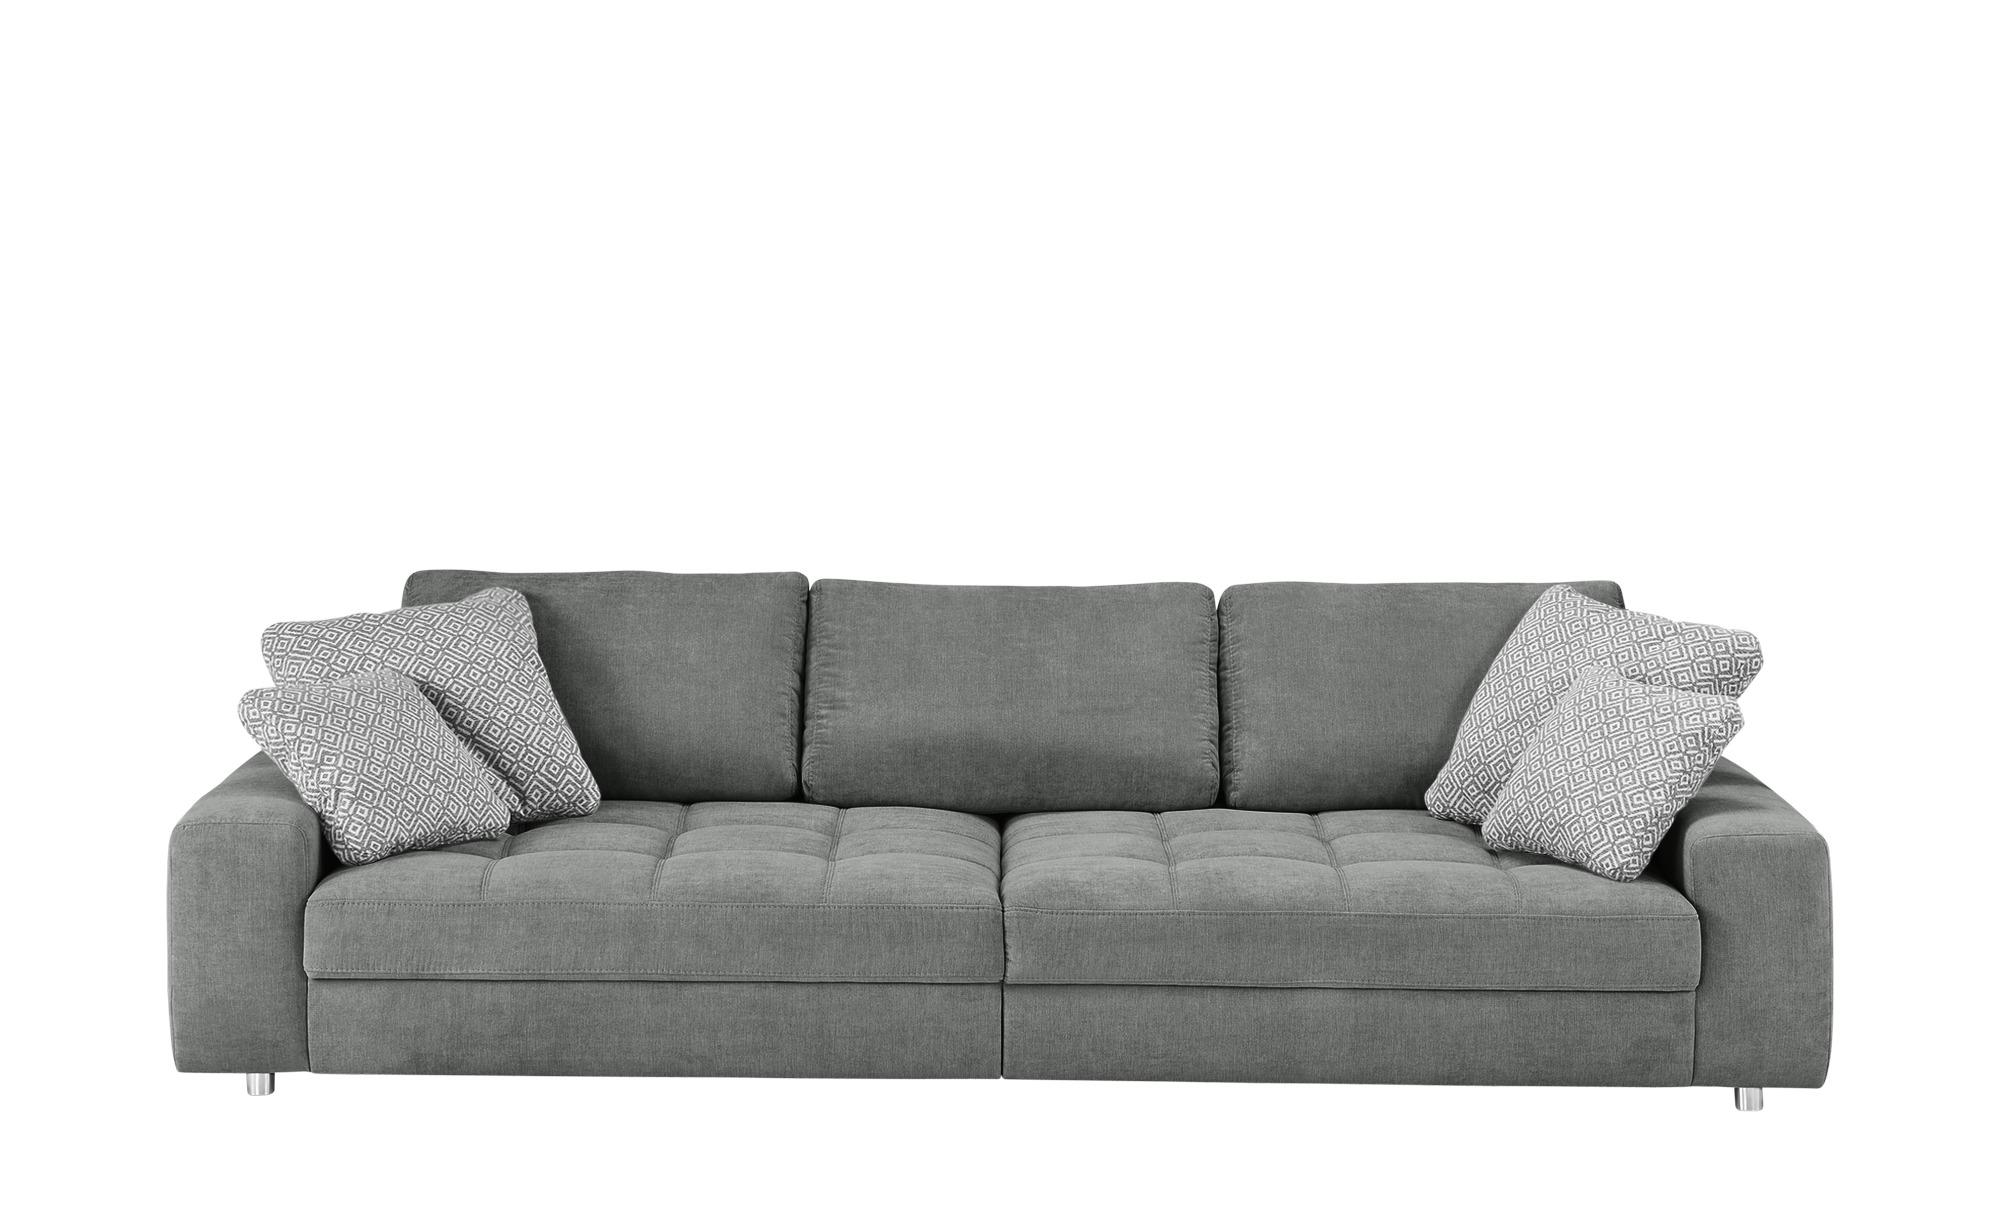 bobb Big Sofa  Arissa ¦ grau ¦ Maße (cm): B: 292 H: 84 T: 120 Polstermöbel > Sofas > Big-Sofas - Höffner